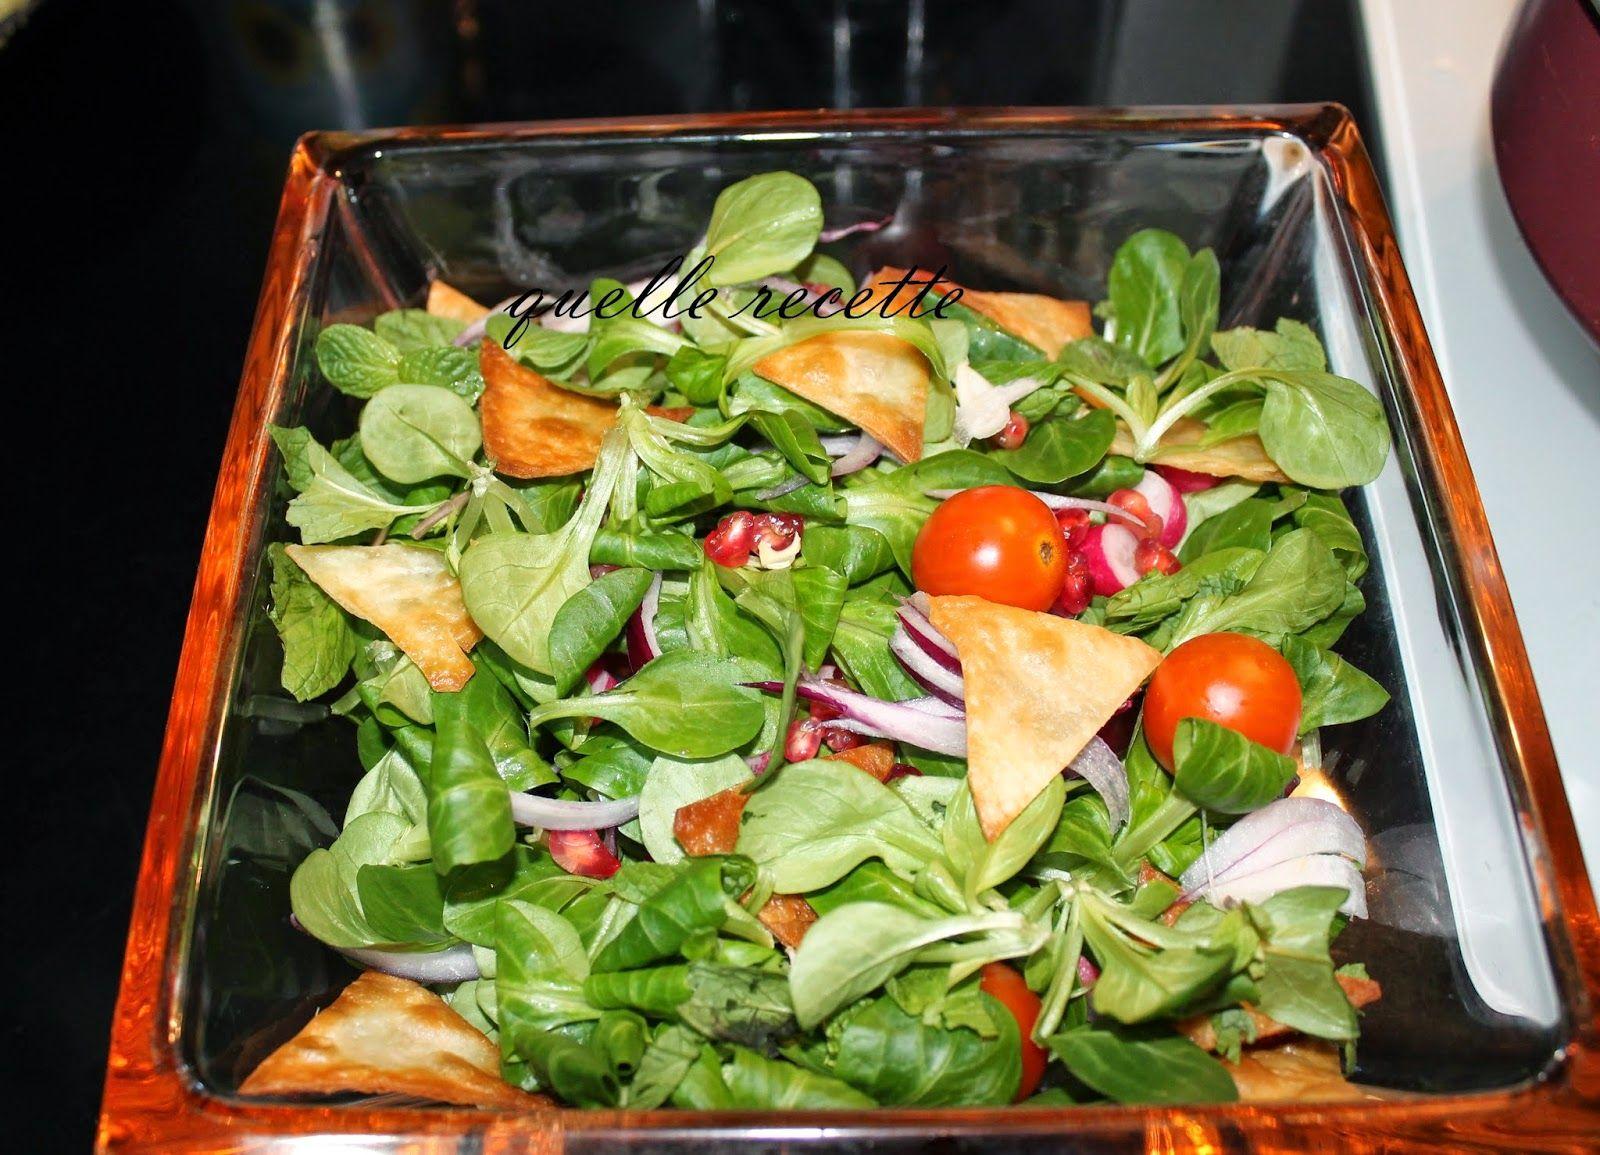 Quelle recette ?: Fattouche (Salade Libanaise) | Salade ...